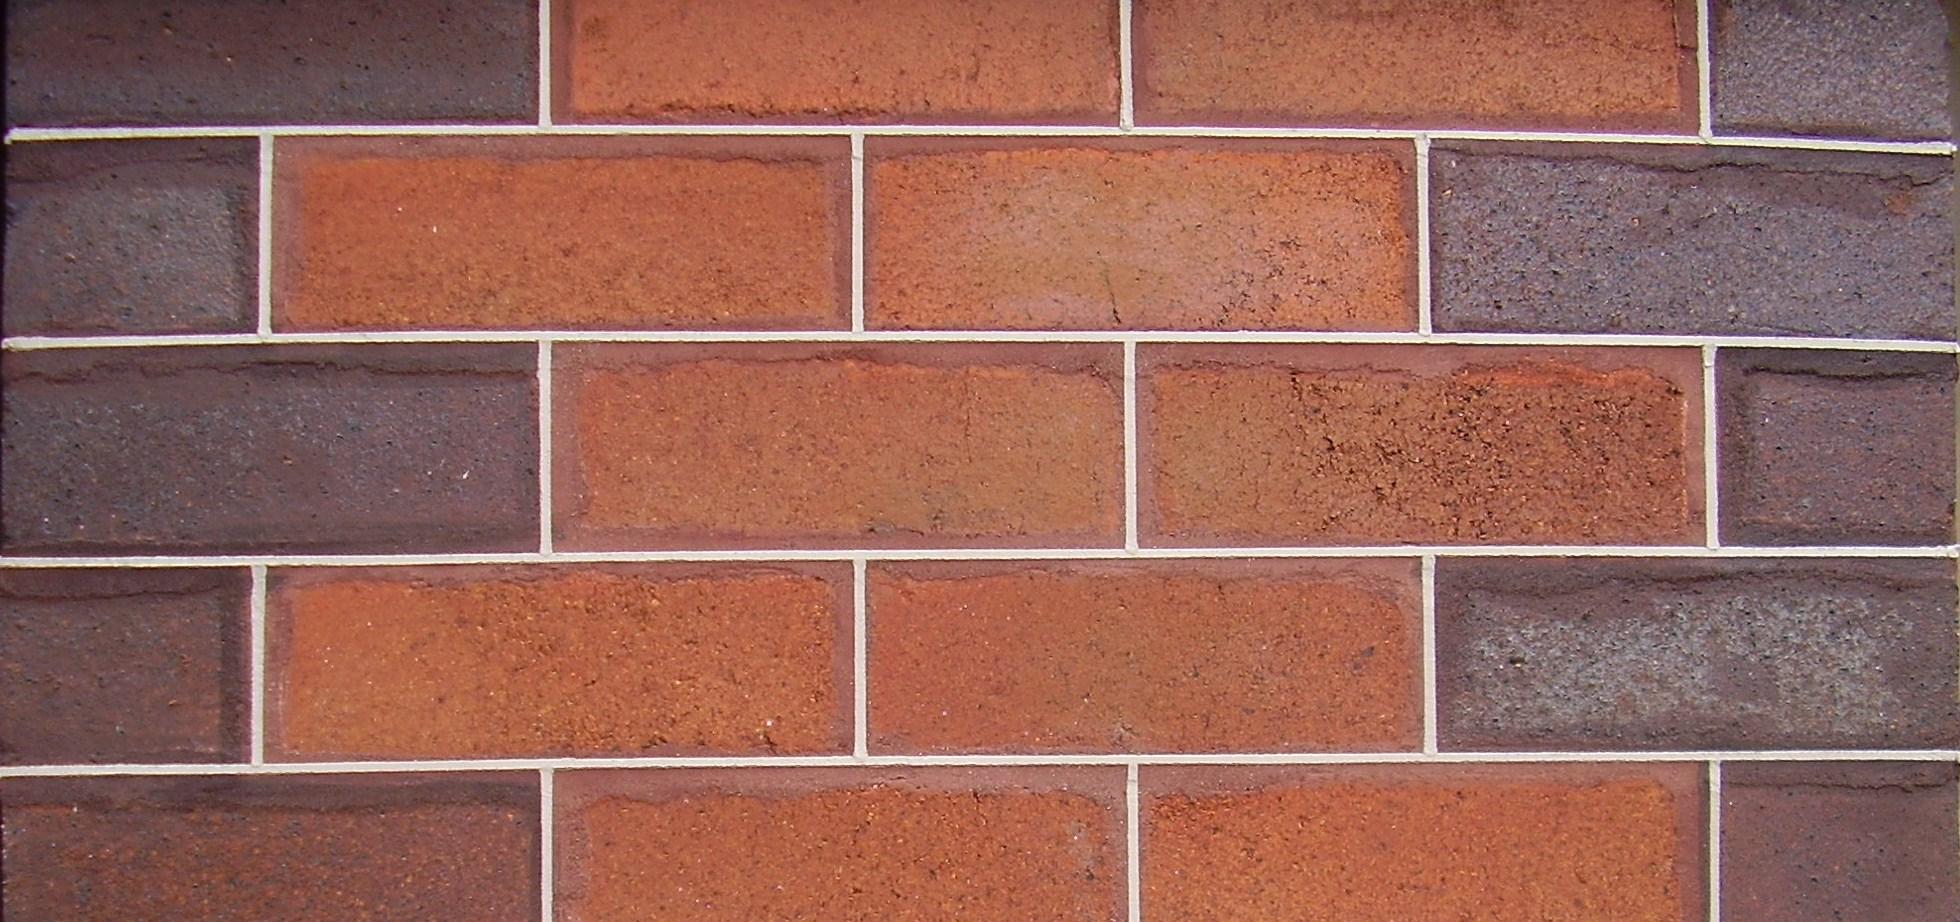 masonry-contractors-arlington-heights